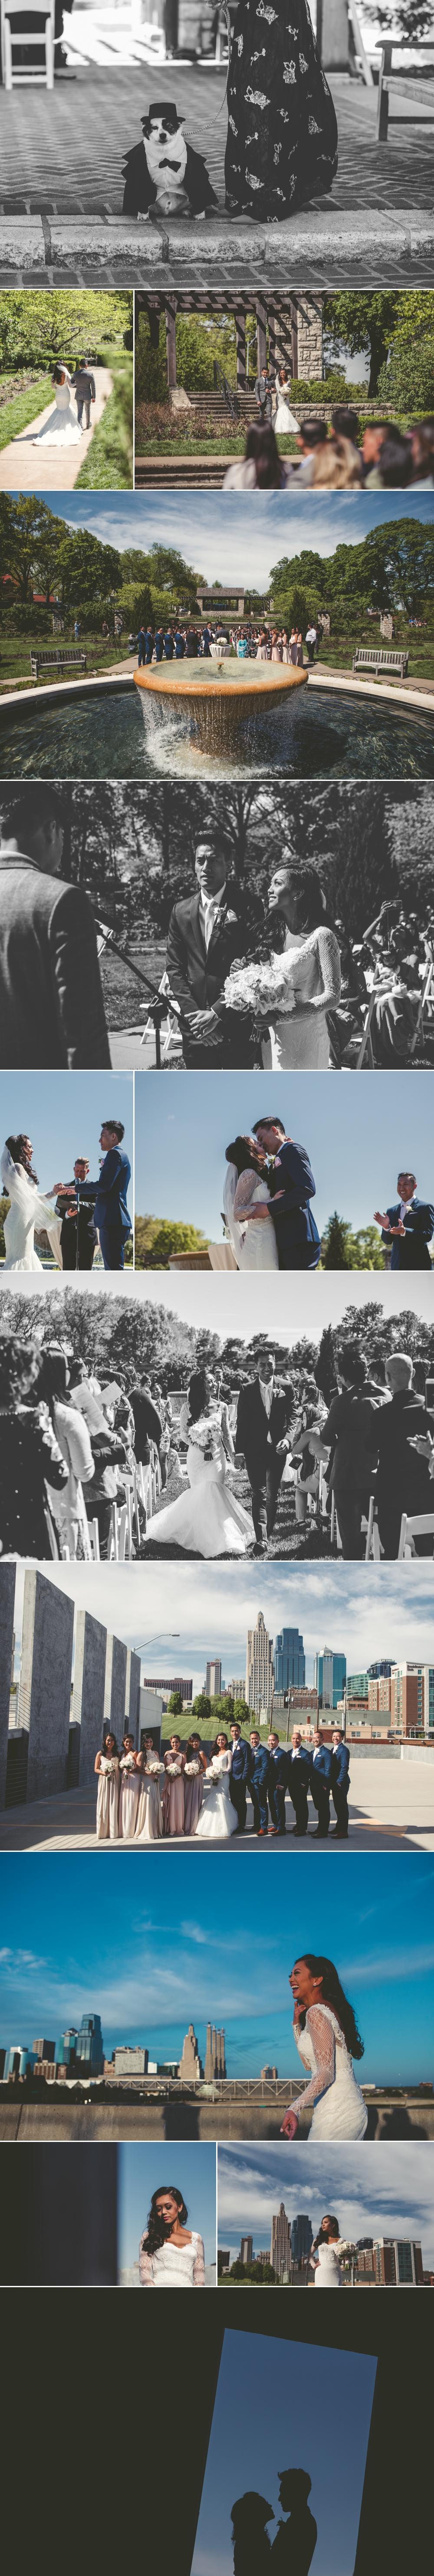 jason_domingues_photography_best_kansas_city_wedding_photographer_kc_weddings_loose_park_monarch_room_0002